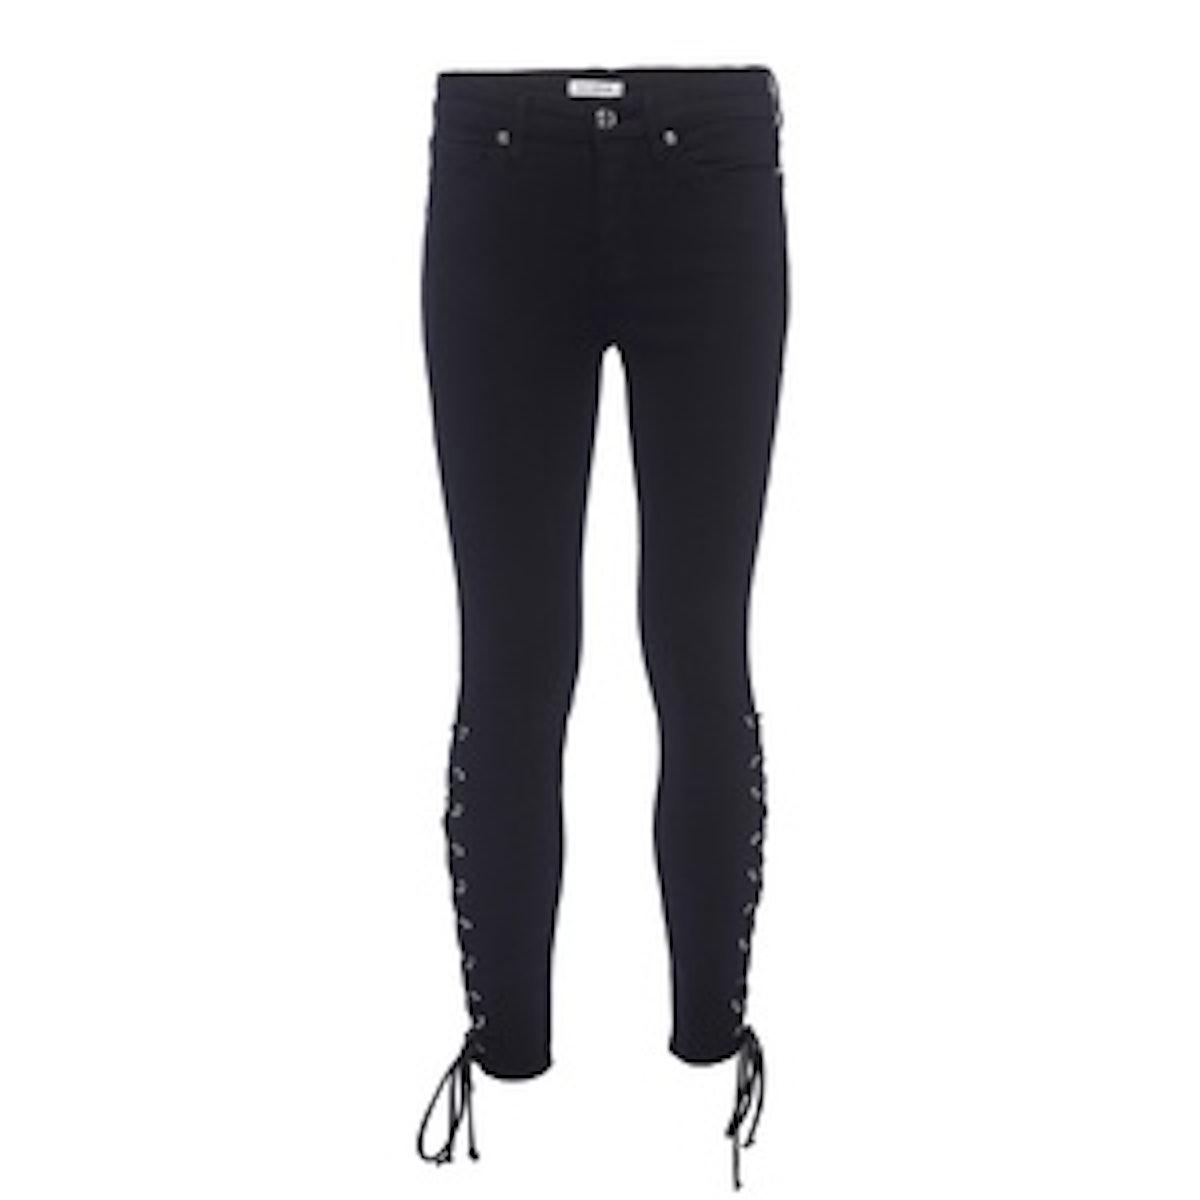 Good Legs Crop Lace Up